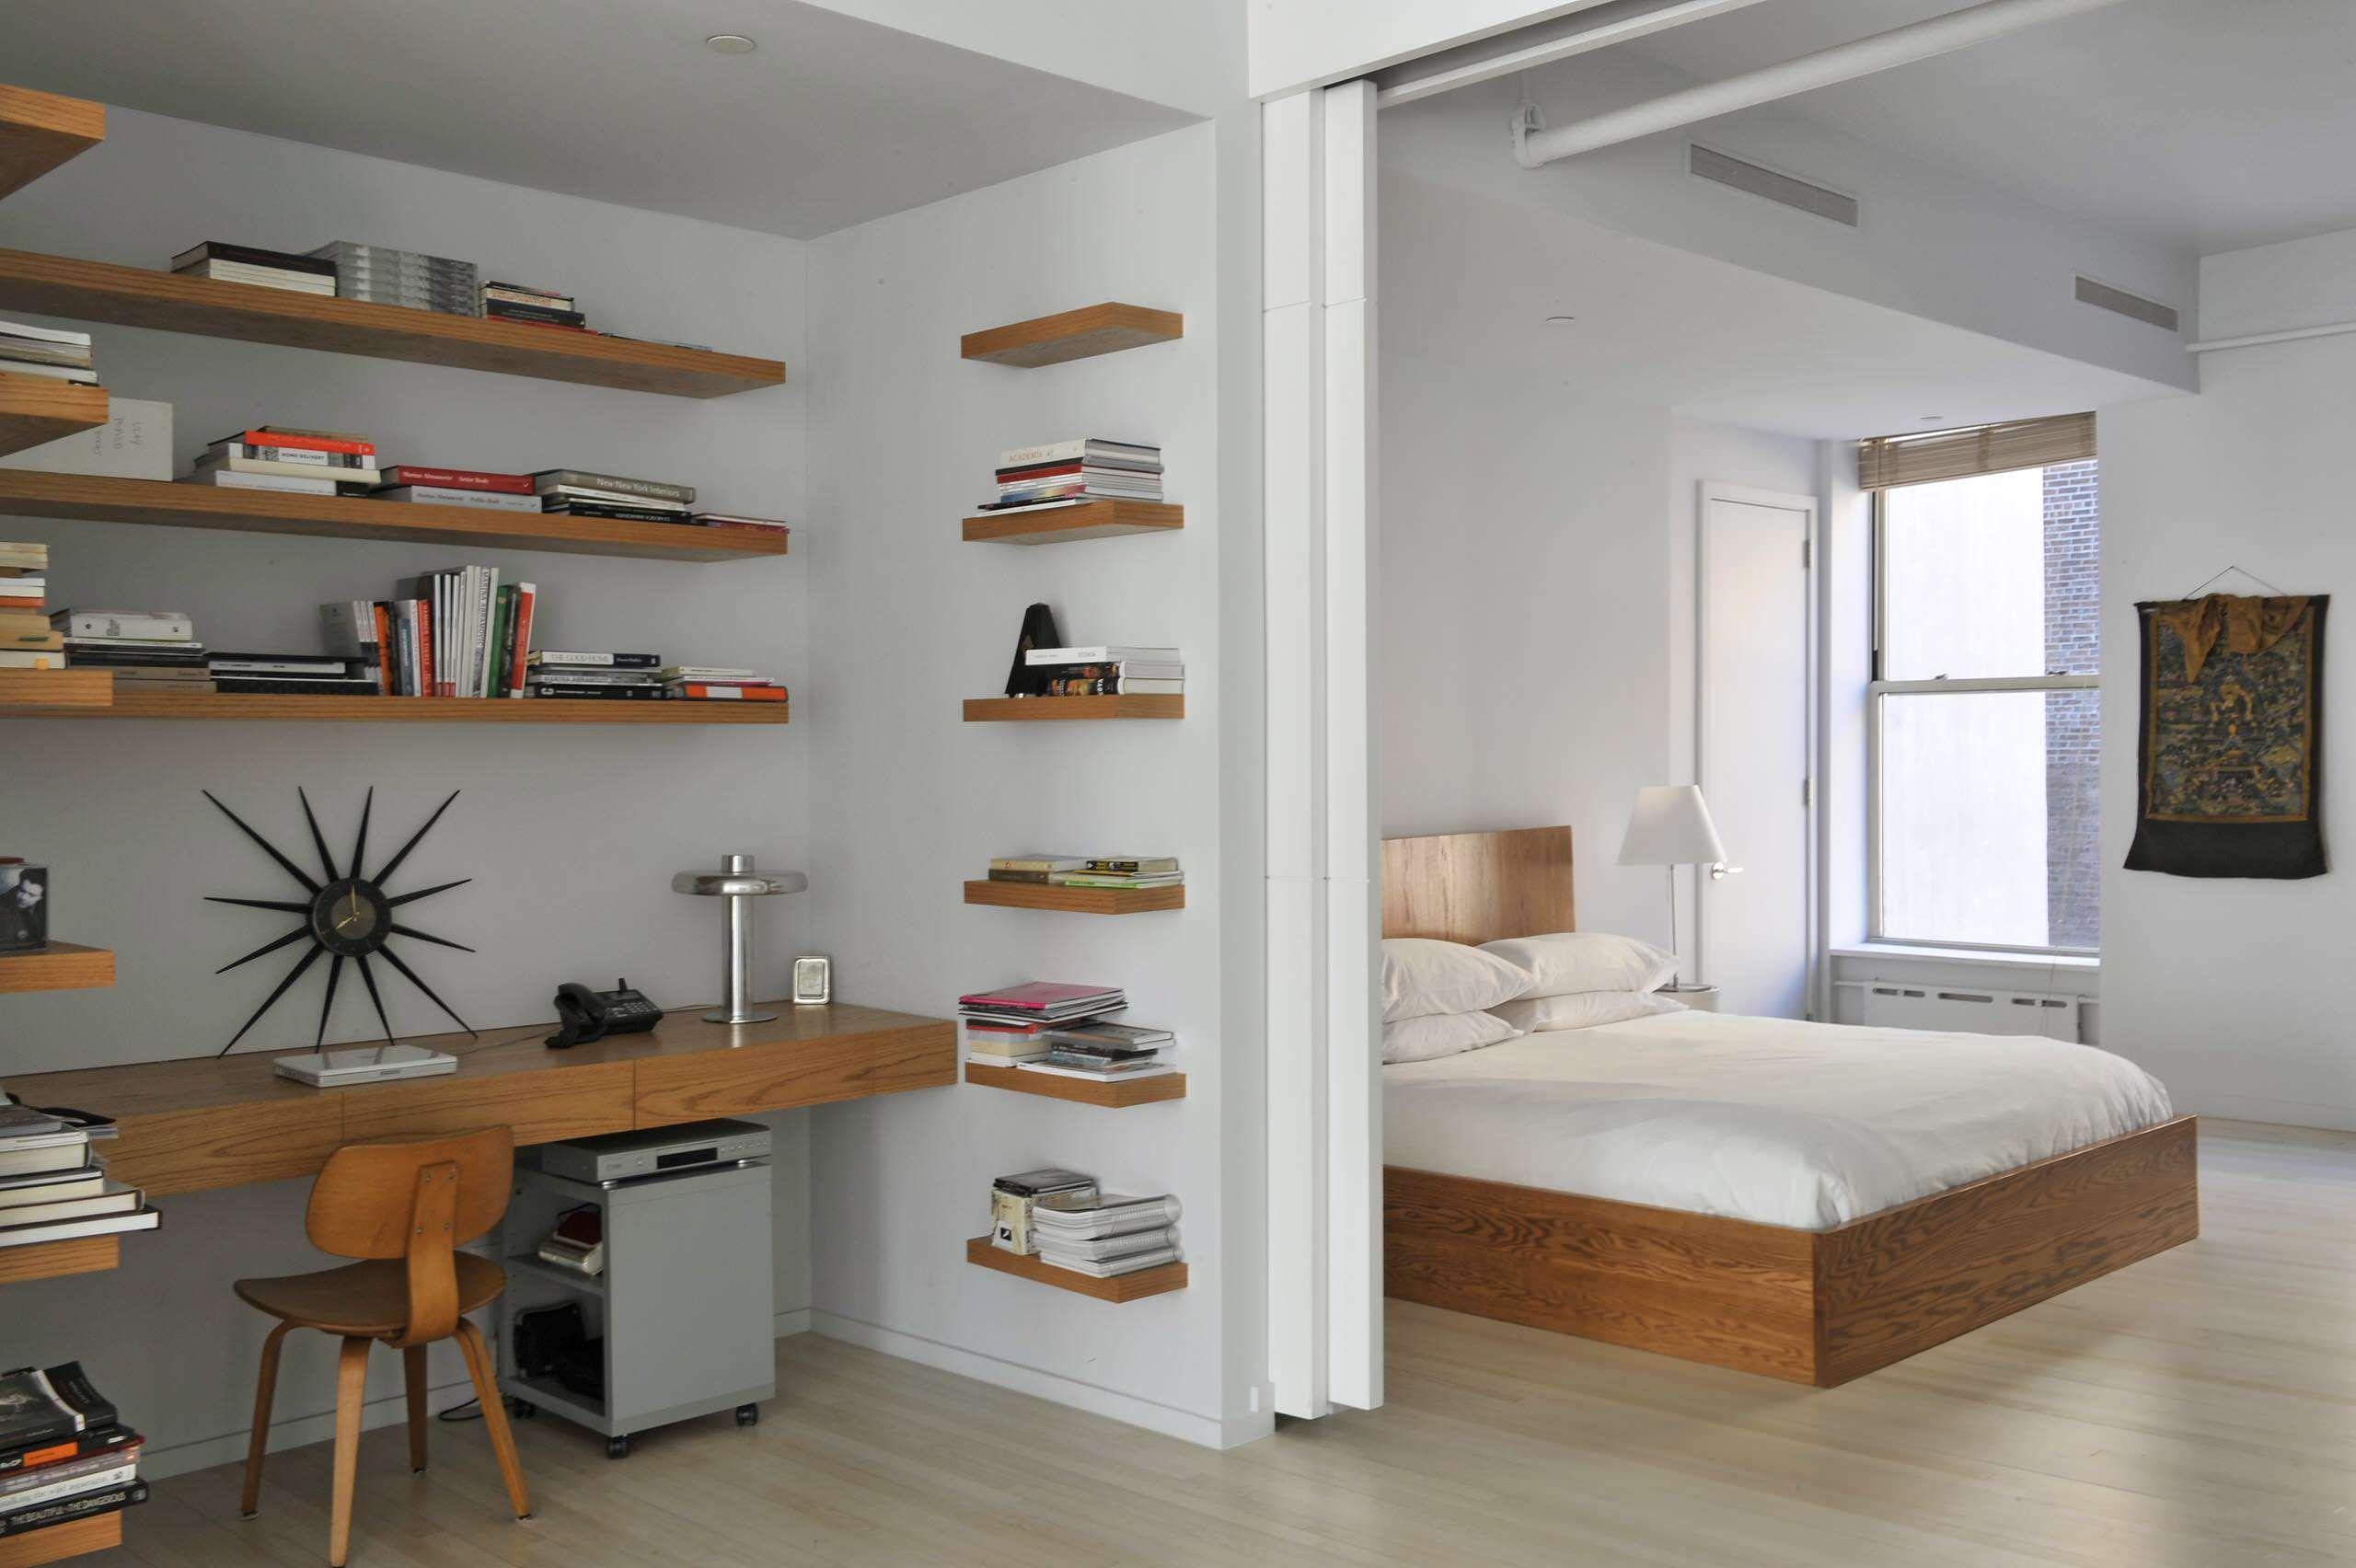 1000+ images about DESK on Pinterest | Modern home office furniture, Modern  home offices and Offices